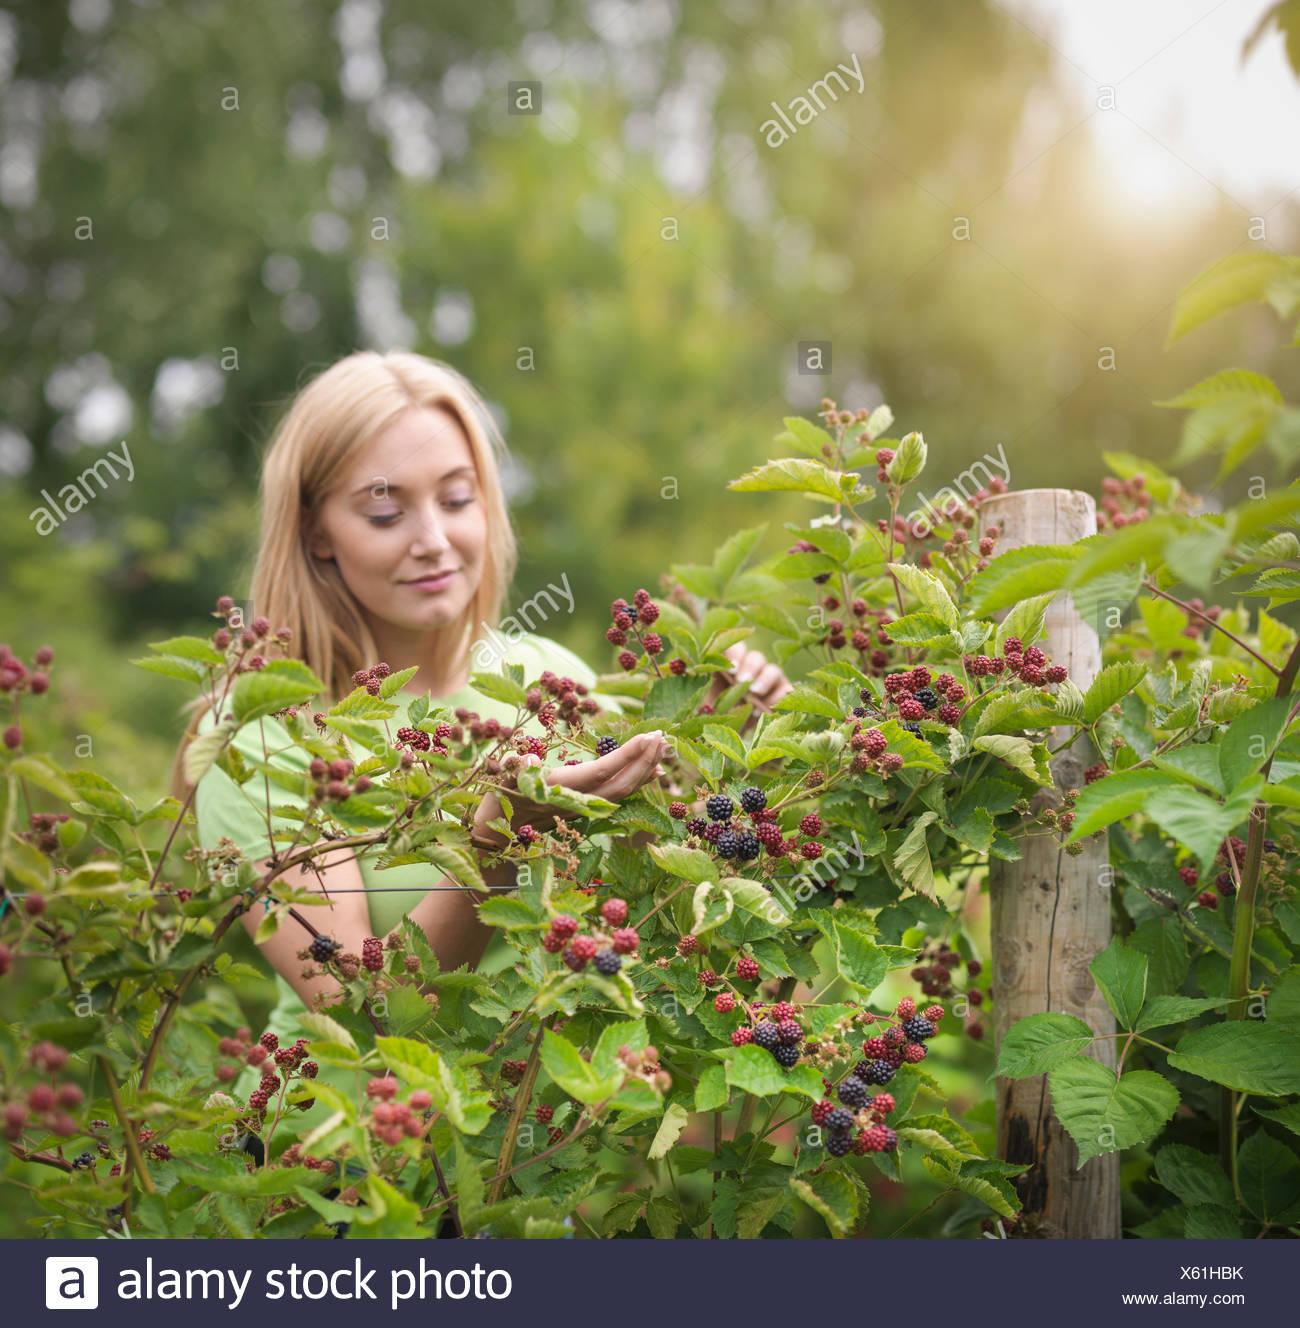 Working picking blackberries on fruit farm - Stock Image